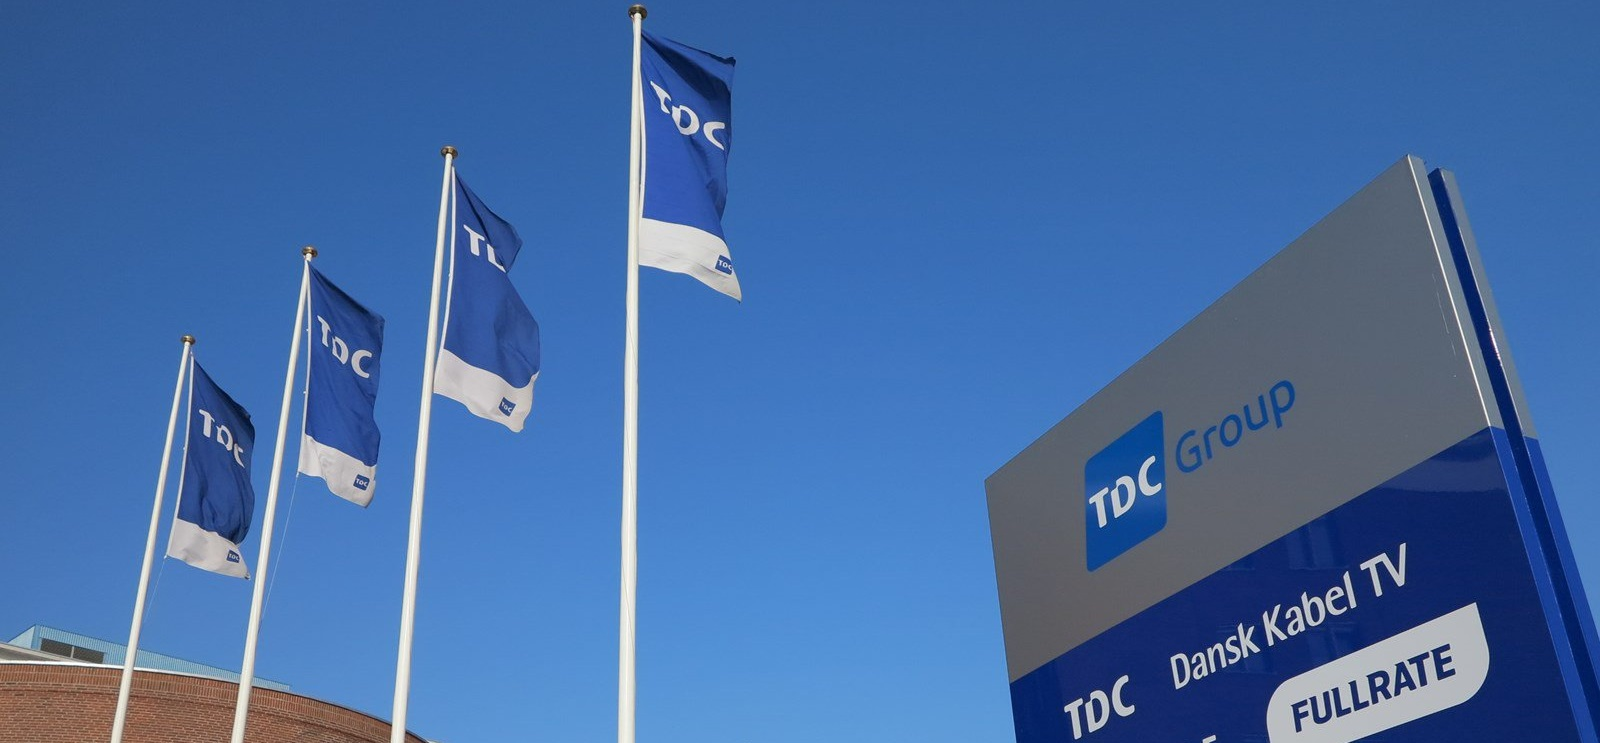 Danish Telecom TDC Accepts $ 6.7 Bn Takeover Bid from Macquarie Consortium